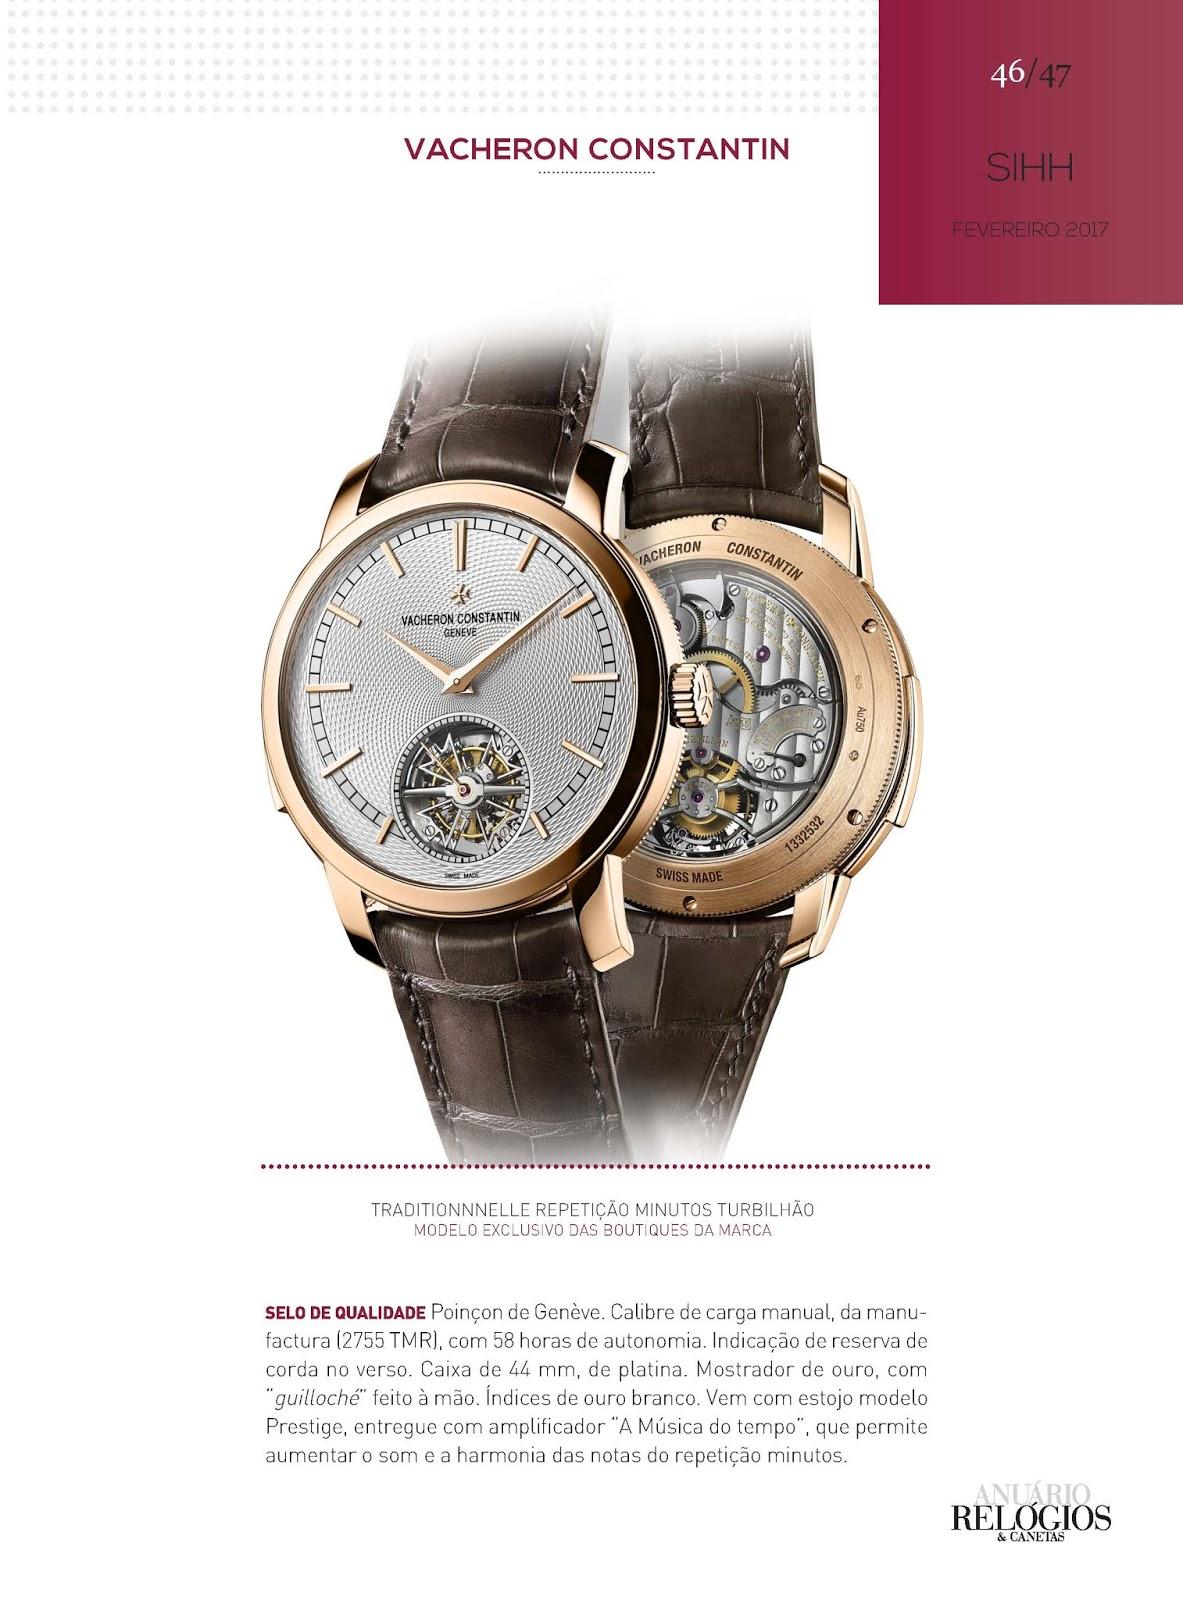 f643242d17e Os relógios Vacheron Constantin no Relógios   Canetas online